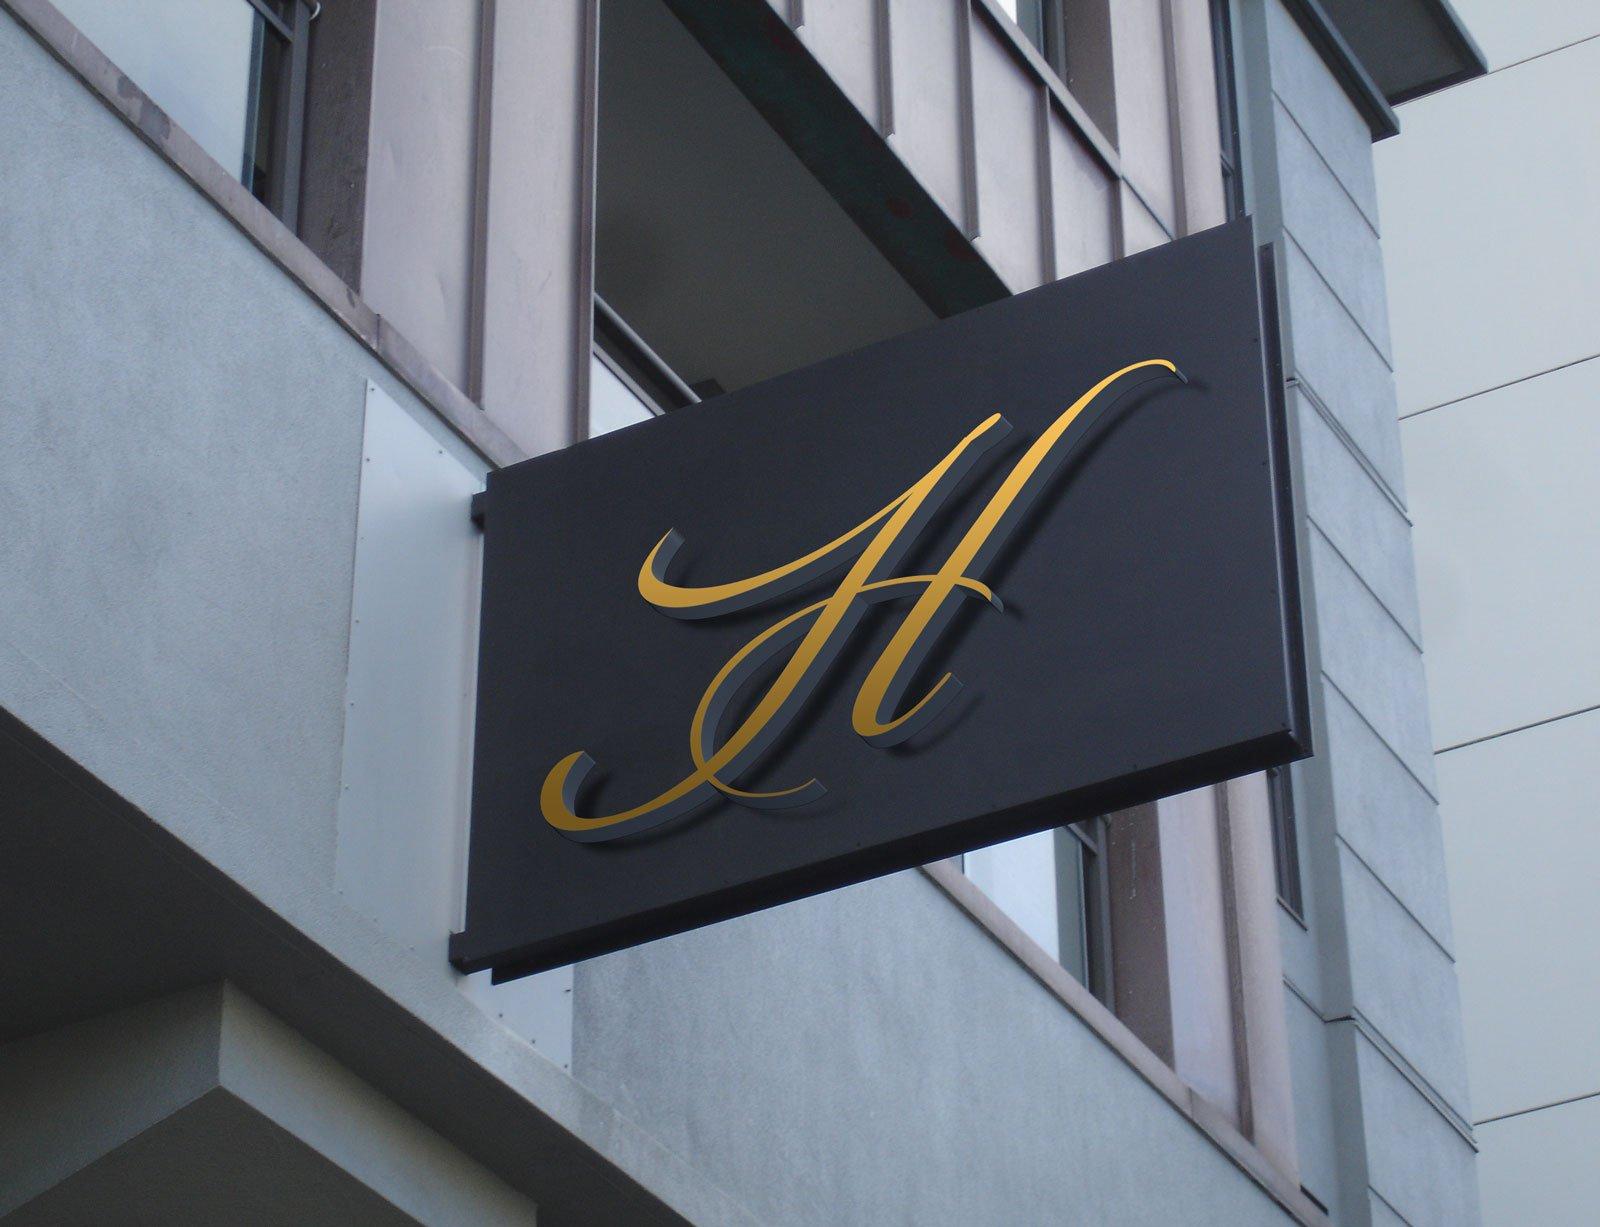 Free Hotel Wall Mounted Signage Mockup Psd Designbolts